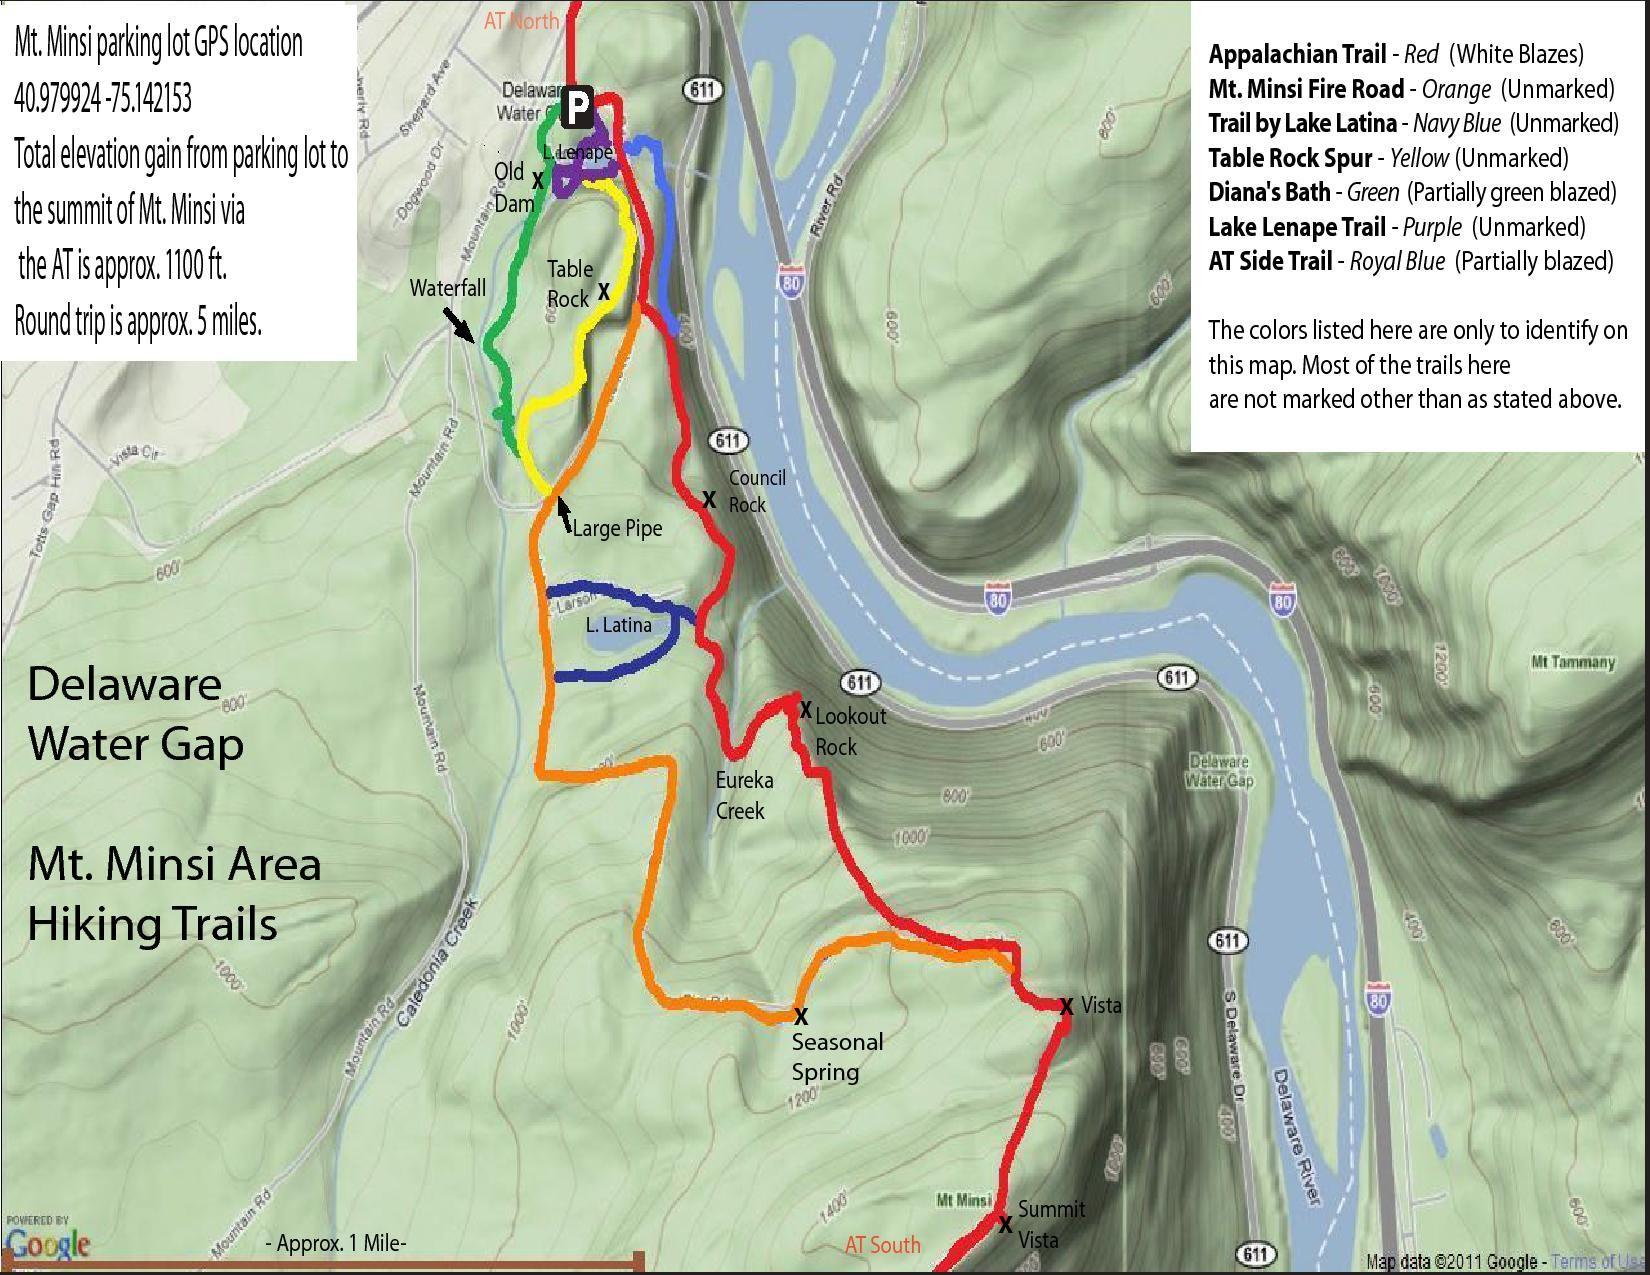 map delaware water gap Dwg Mt Minsi Area Map Jpg 1 650 1 275 Pixels Delaware Water Gap map delaware water gap